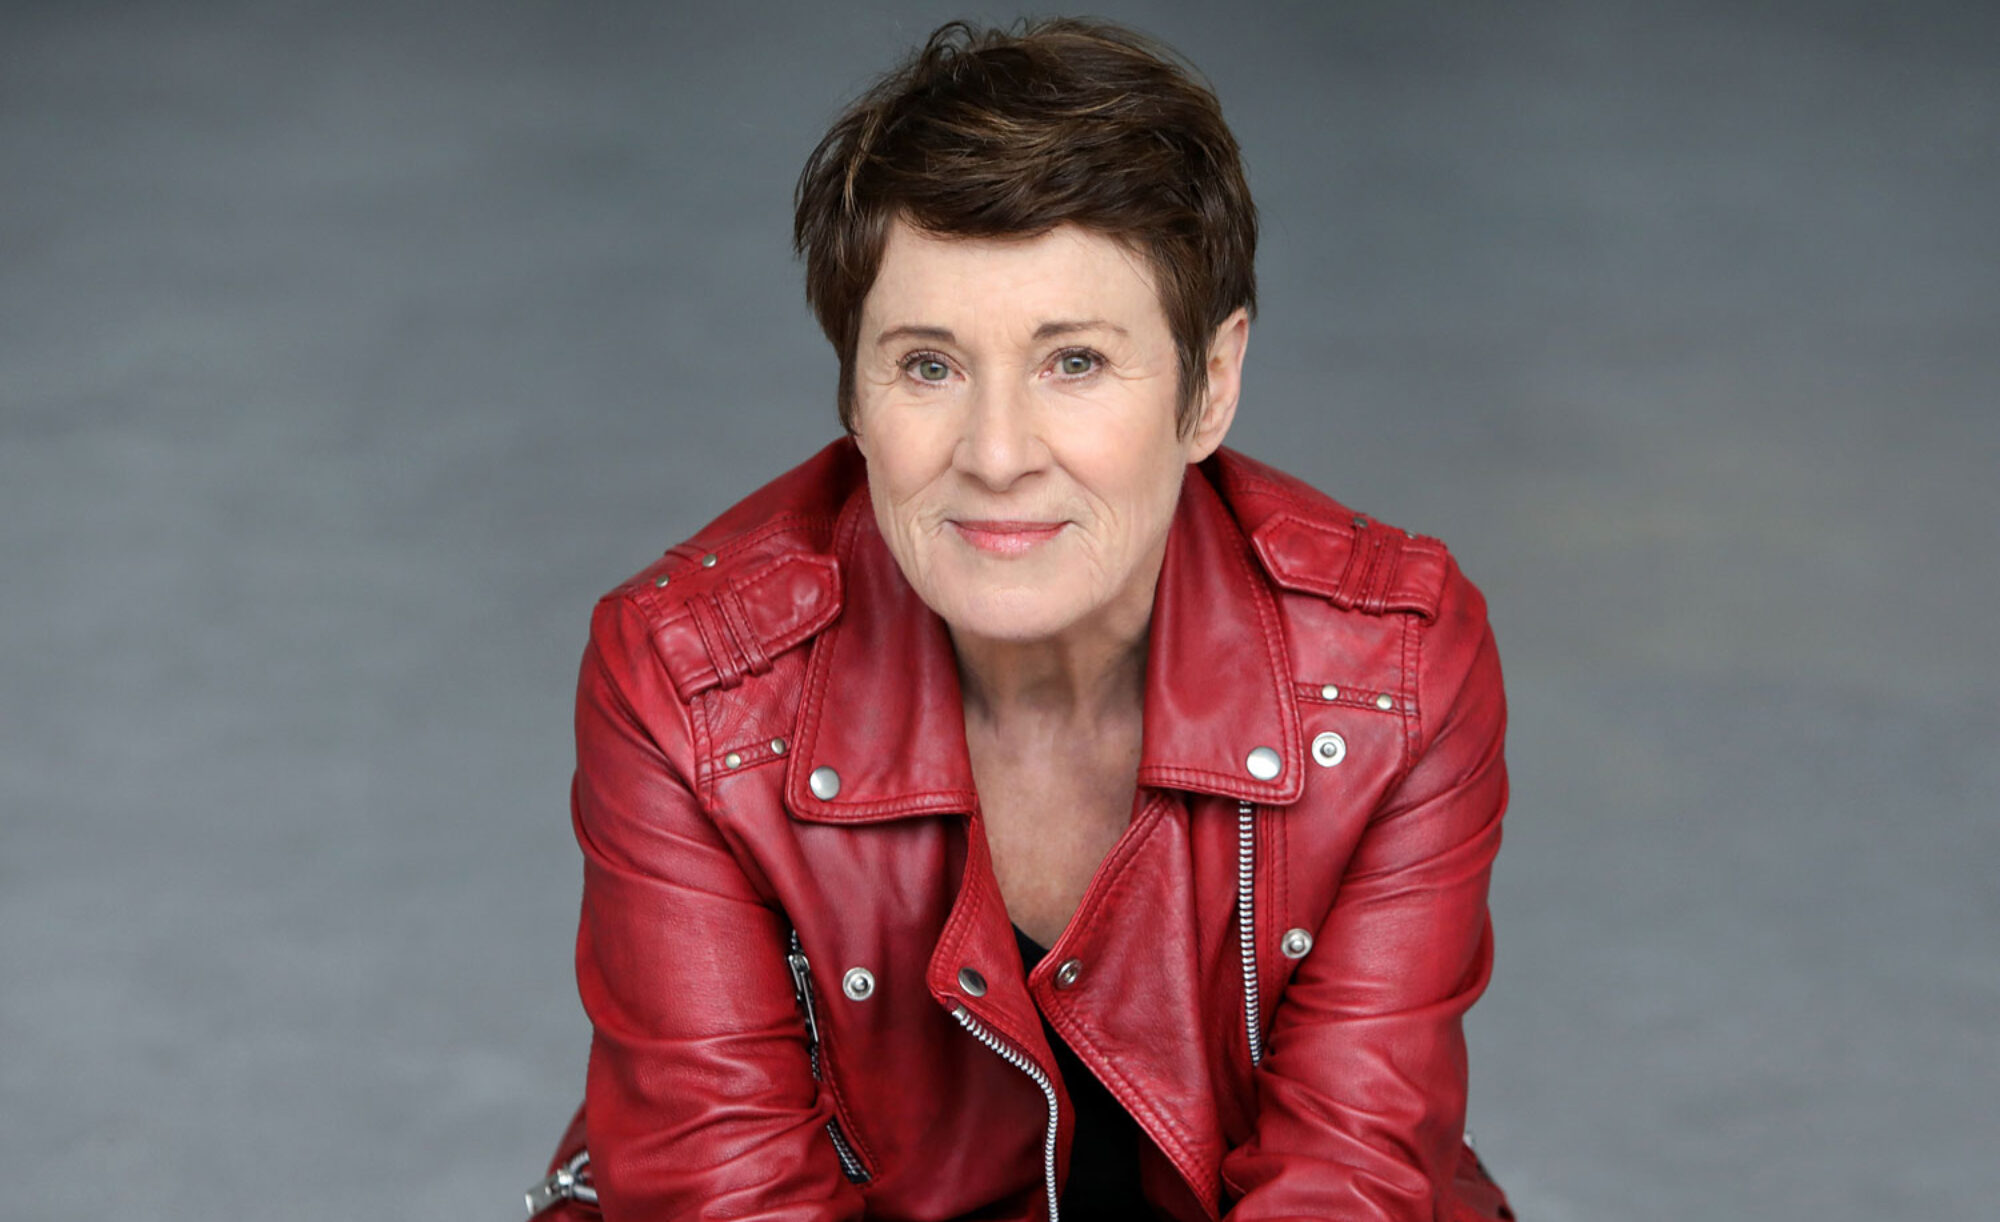 Roswitha Dierck